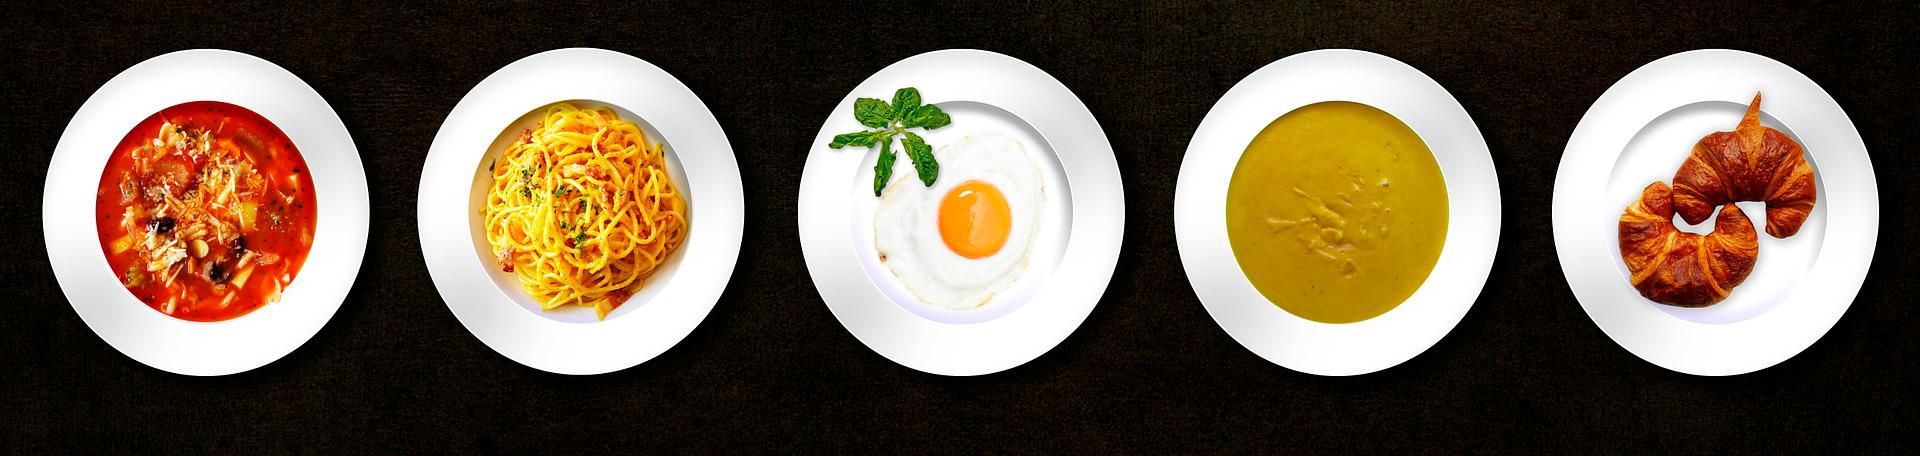 Mad opskrift retter gastronomi restaurant